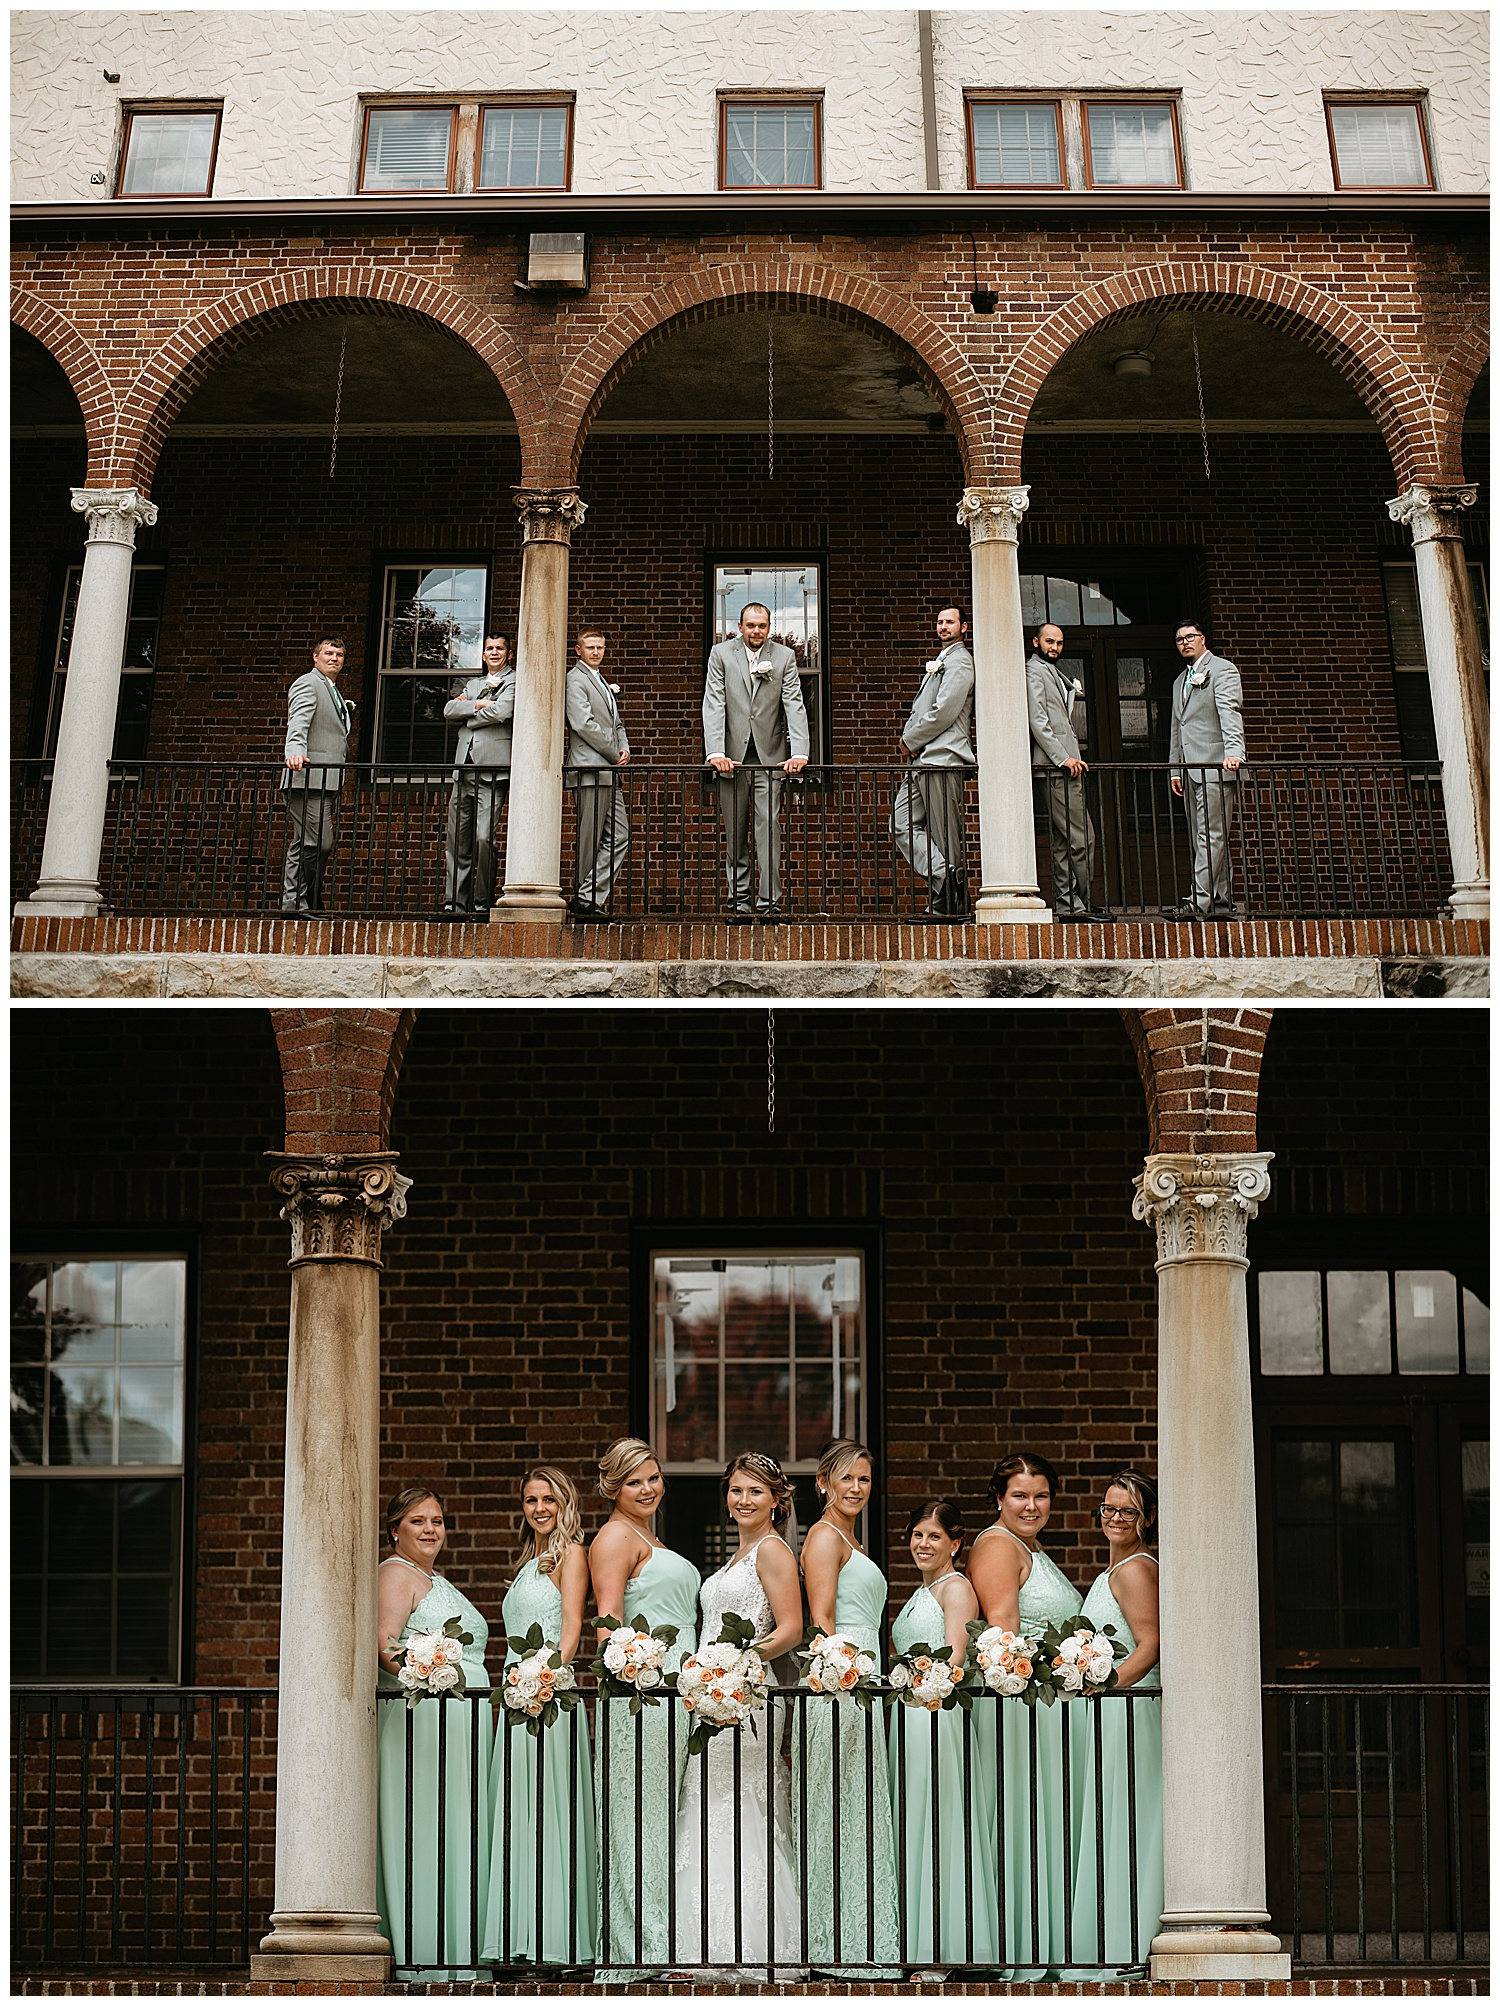 NEPA-Lehigh-Valley-Wedding-Photographer-at-Fountain-Springs-Country-Inn-Ashland-PA_0028.jpg